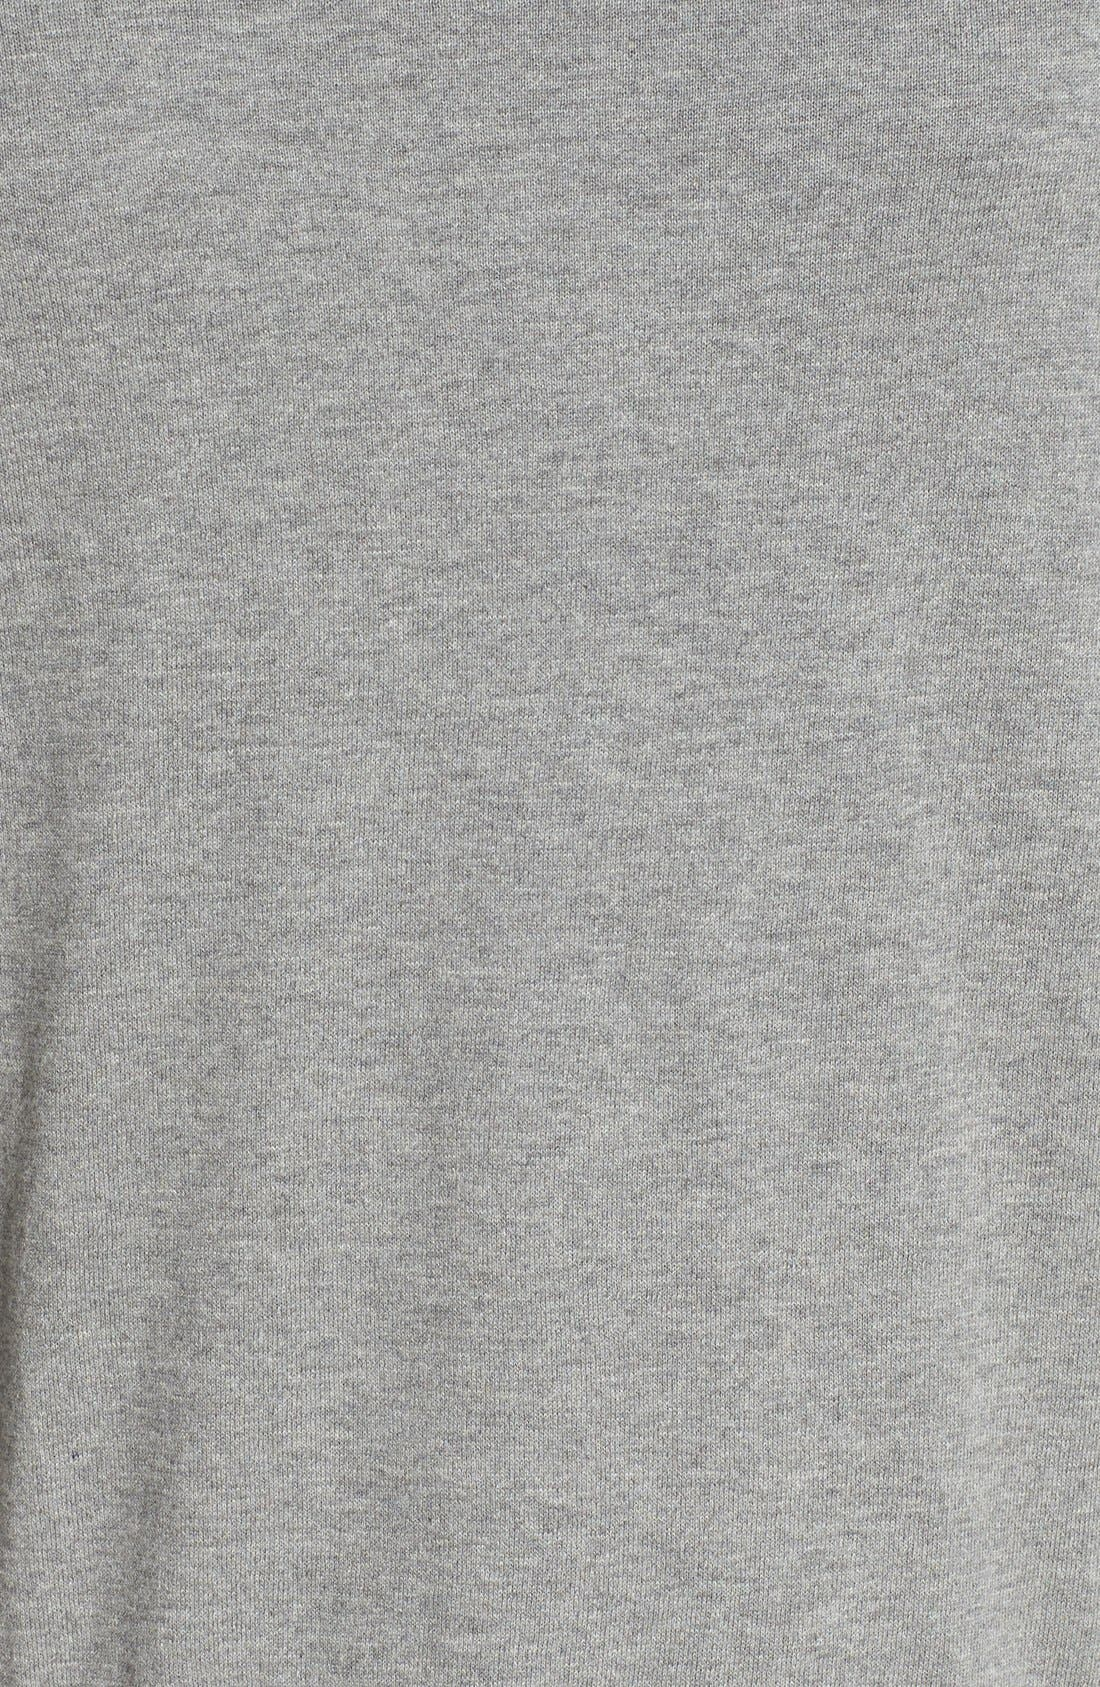 V-Neck Cotton Pullover,                             Alternate thumbnail 5, color,                             020